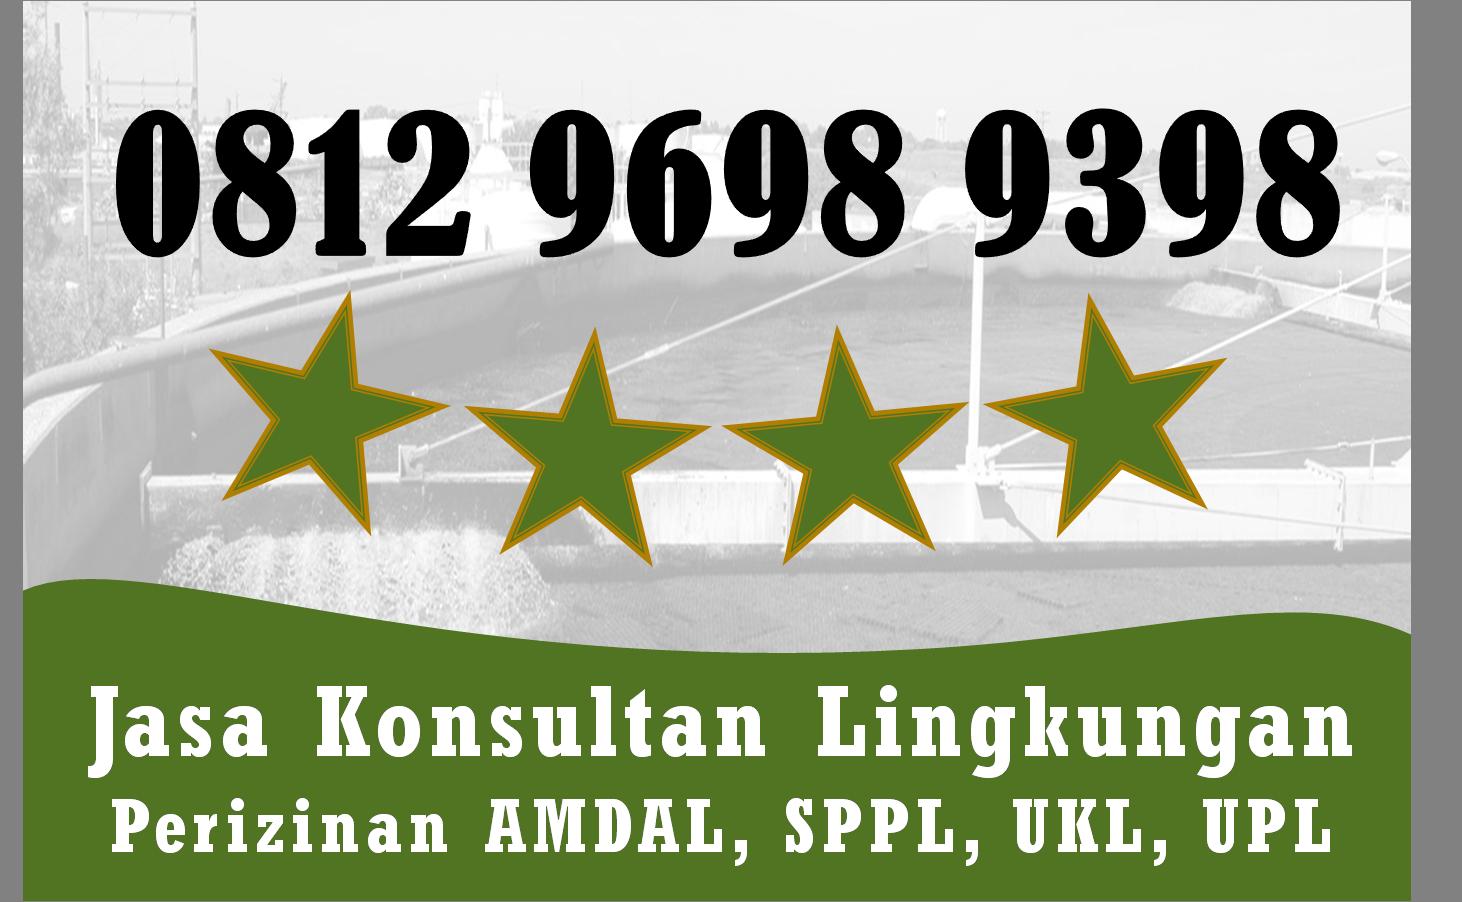 Kini Hadir Telp Wa 0812 9698 9398 Beda Ukl Dan Upl Kab Sukabumi Jawa Barat Di 2020 Mobil Kota Kepulauan Pulau Bangka